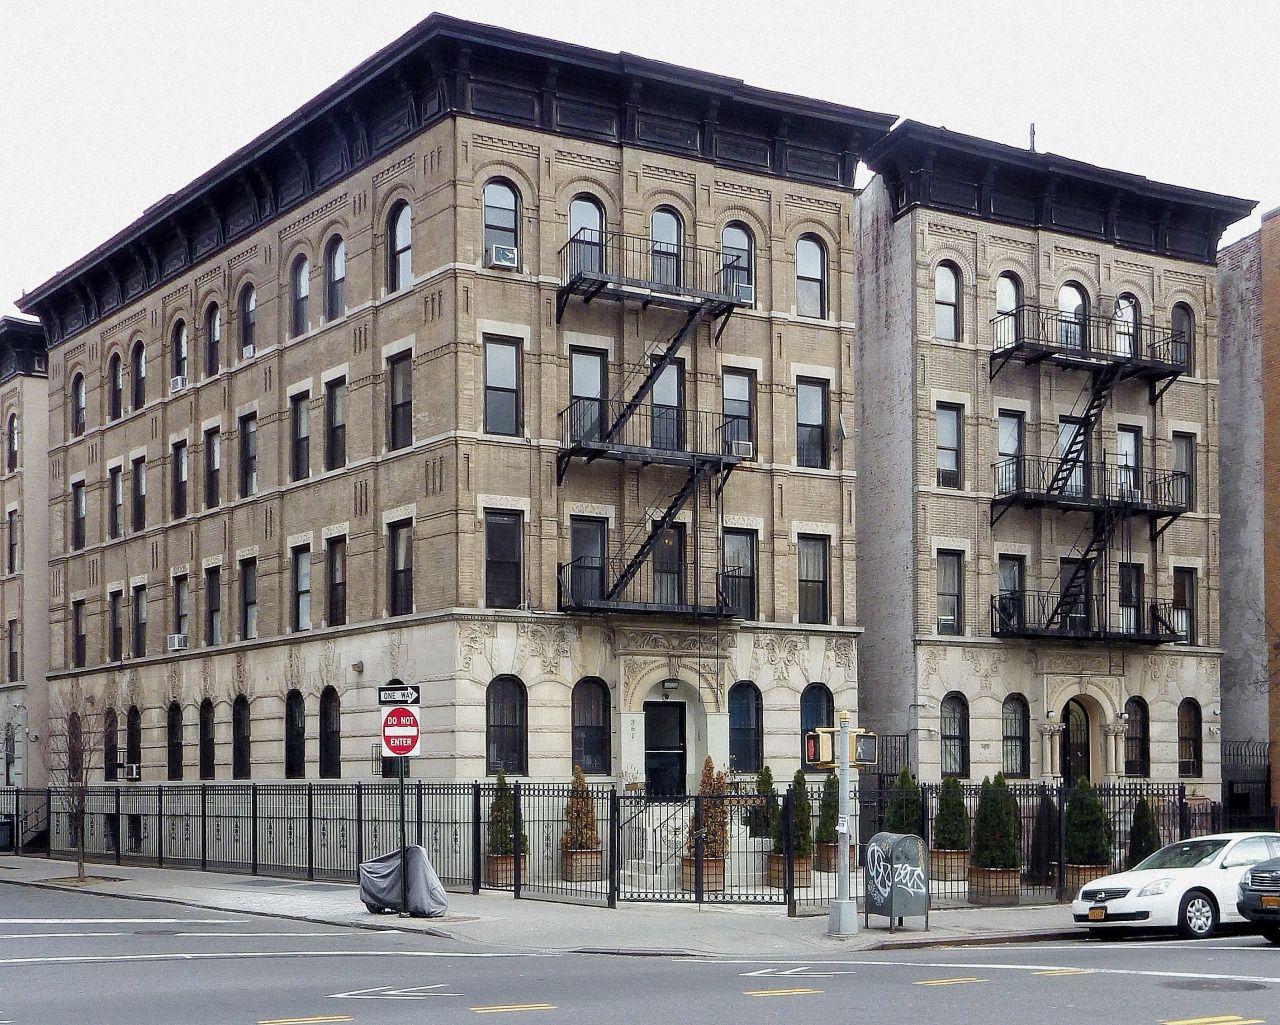 Apartment houses in Flatbush.